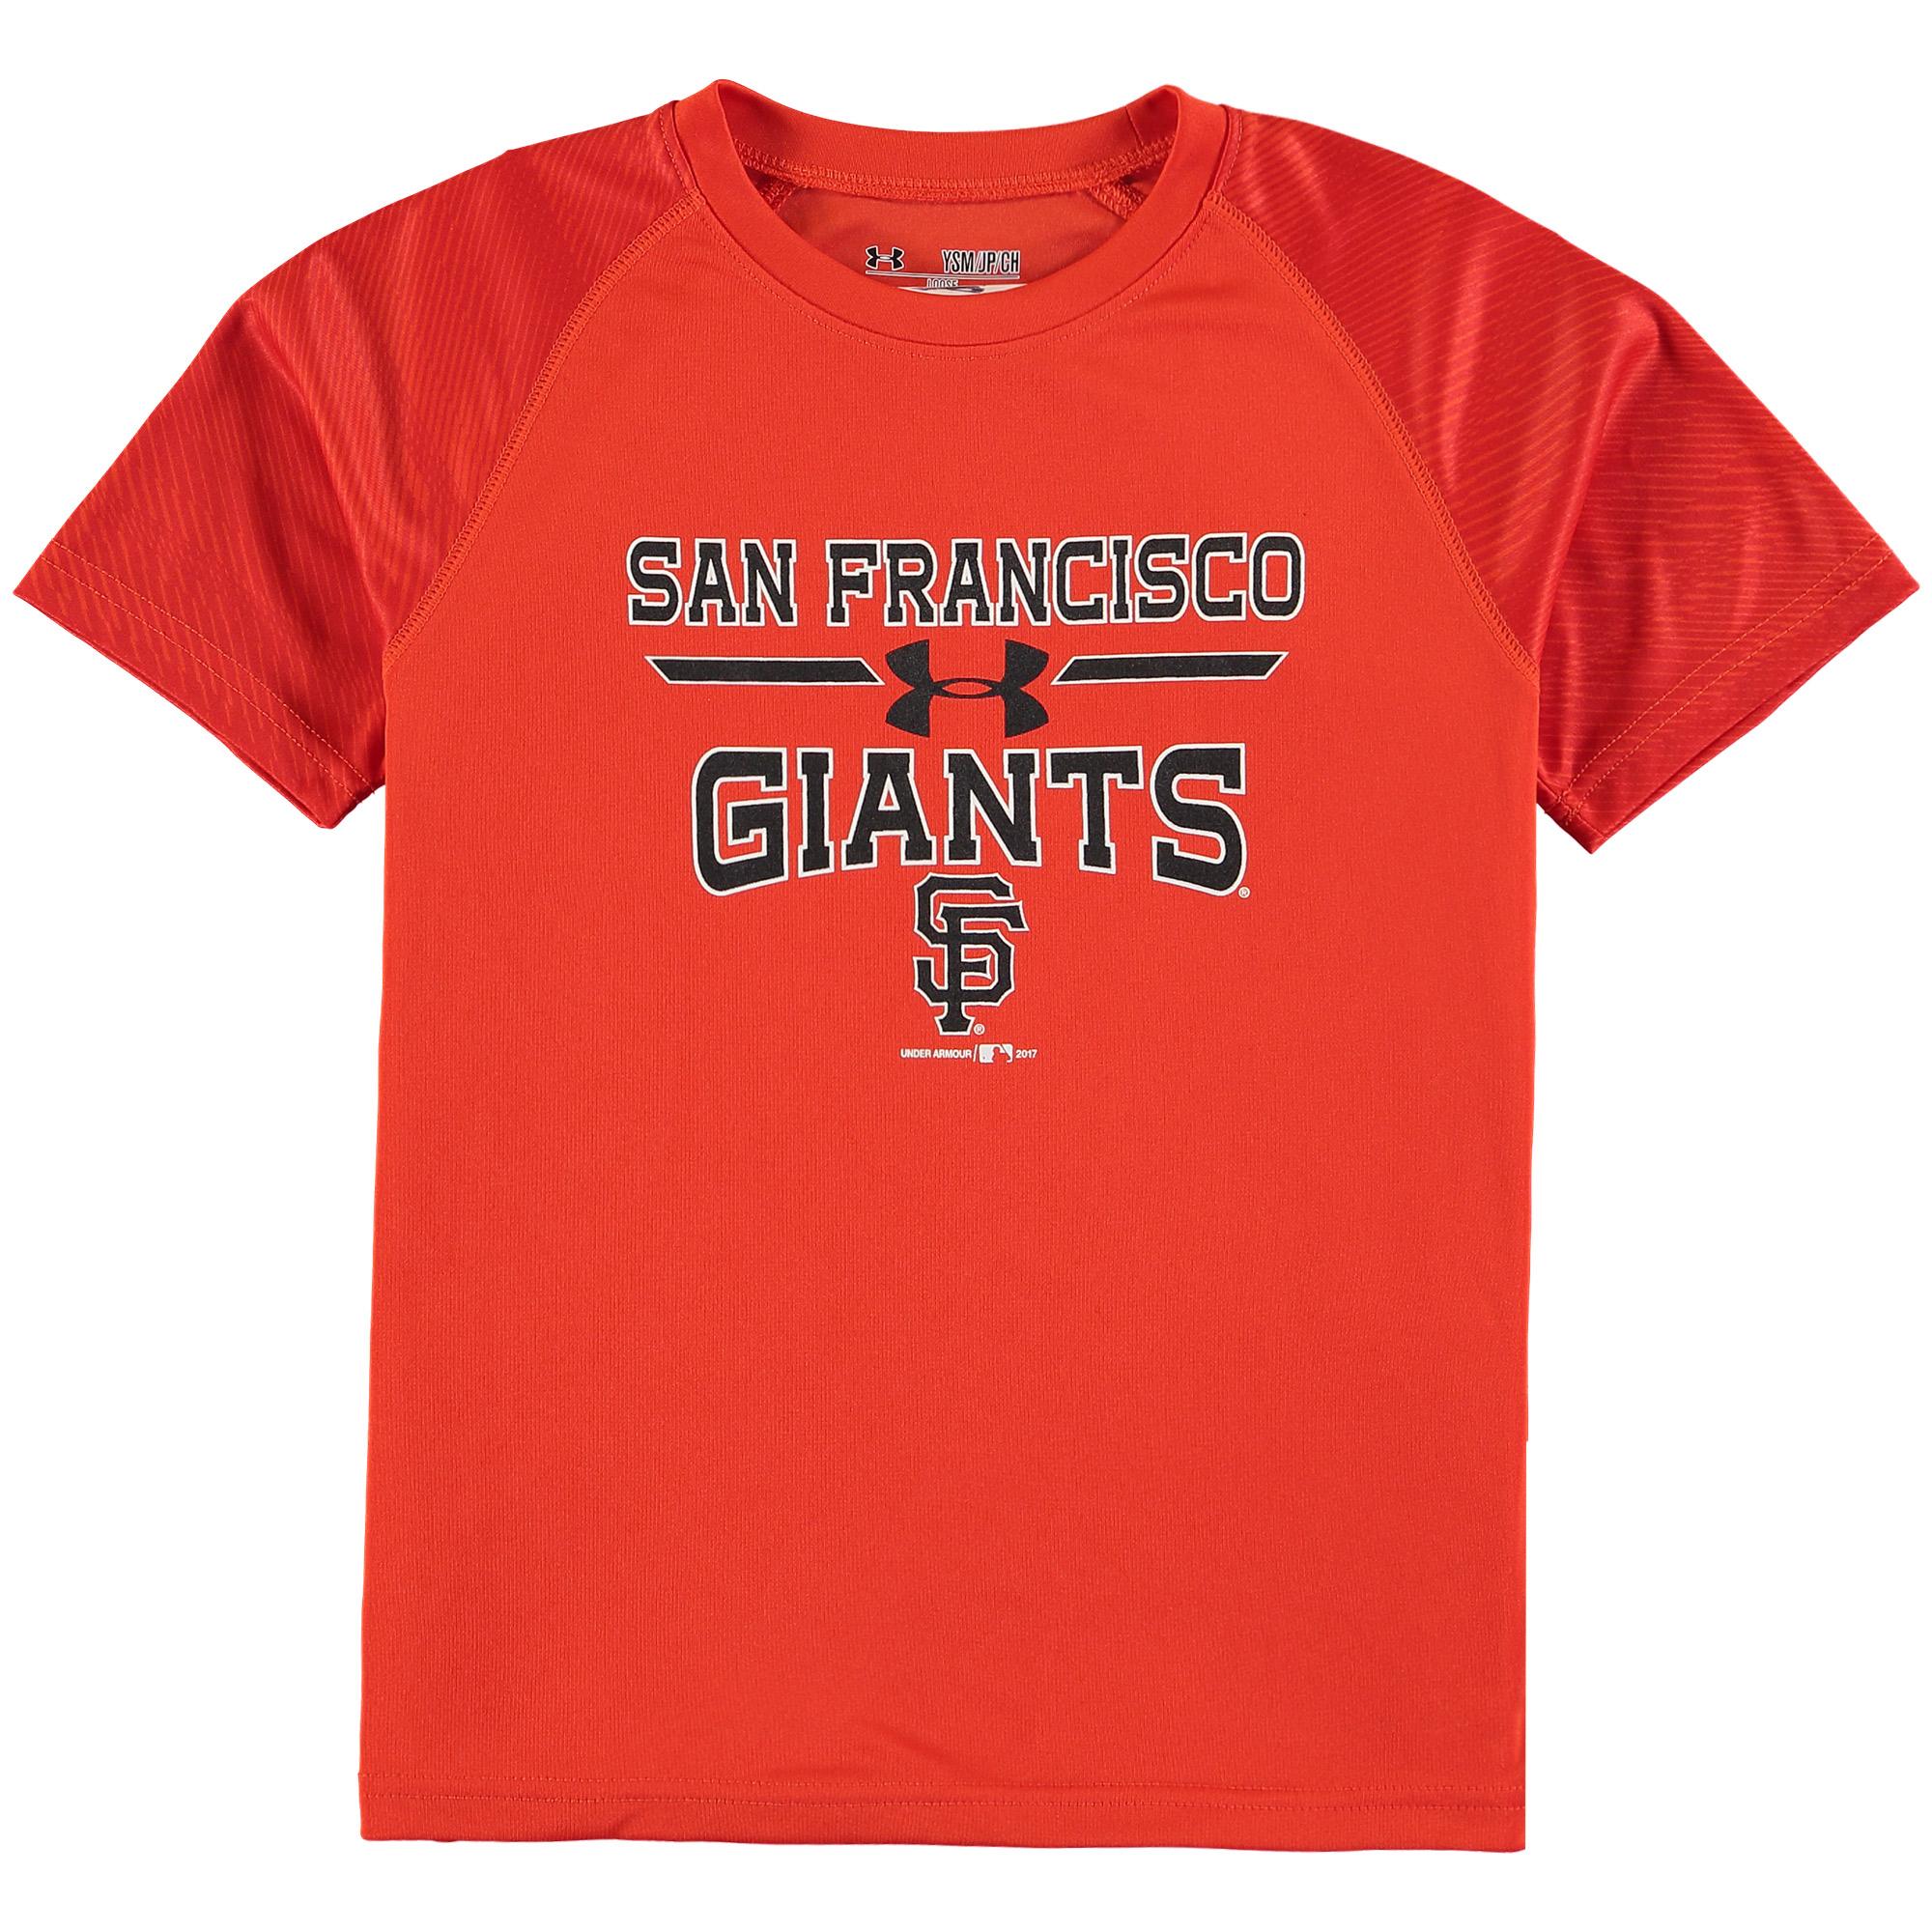 San Francisco Giants Under Armour Youth Tech Electro Color Block T-Shirt - Orange